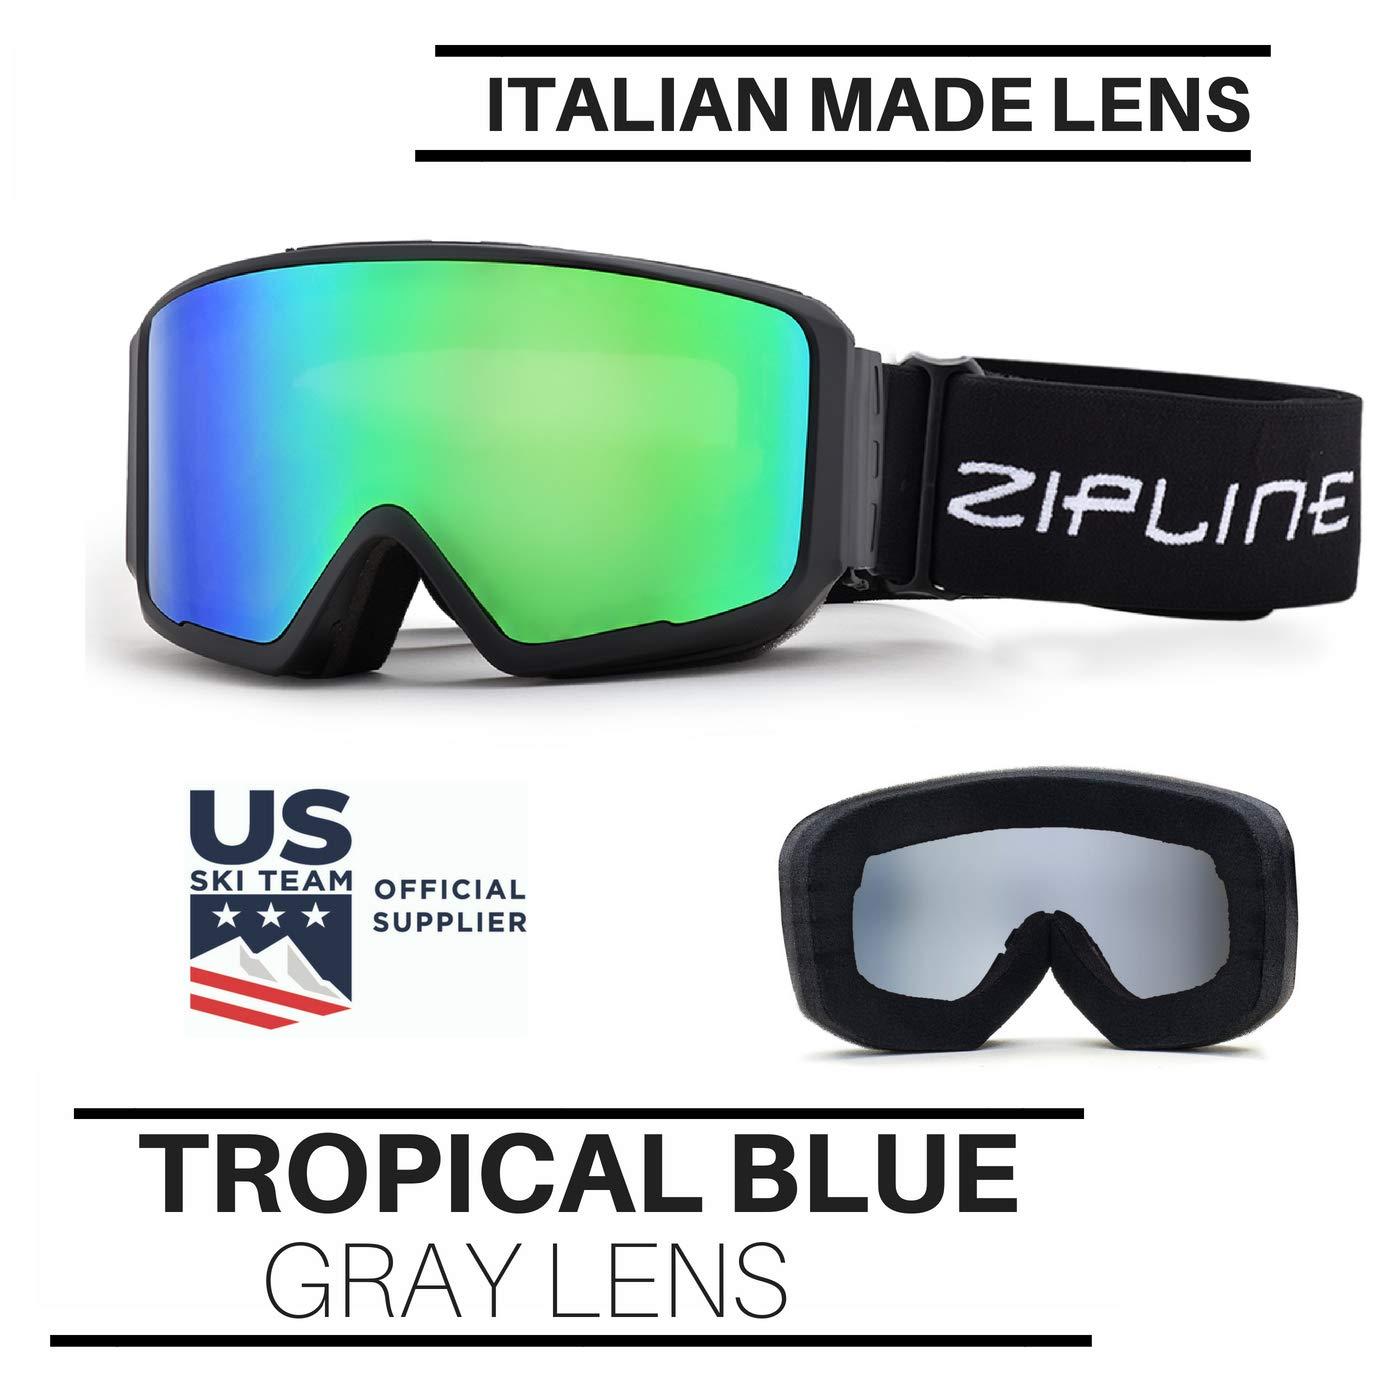 6bdf8a9c9fdb Amazon.com   Zipline Ski Snowboard Snowmobile Goggles Podium CL No Fog  Interchangeable Magnetic Hybrid Lens System - US Ski Team Official Goggle  (Gray ...